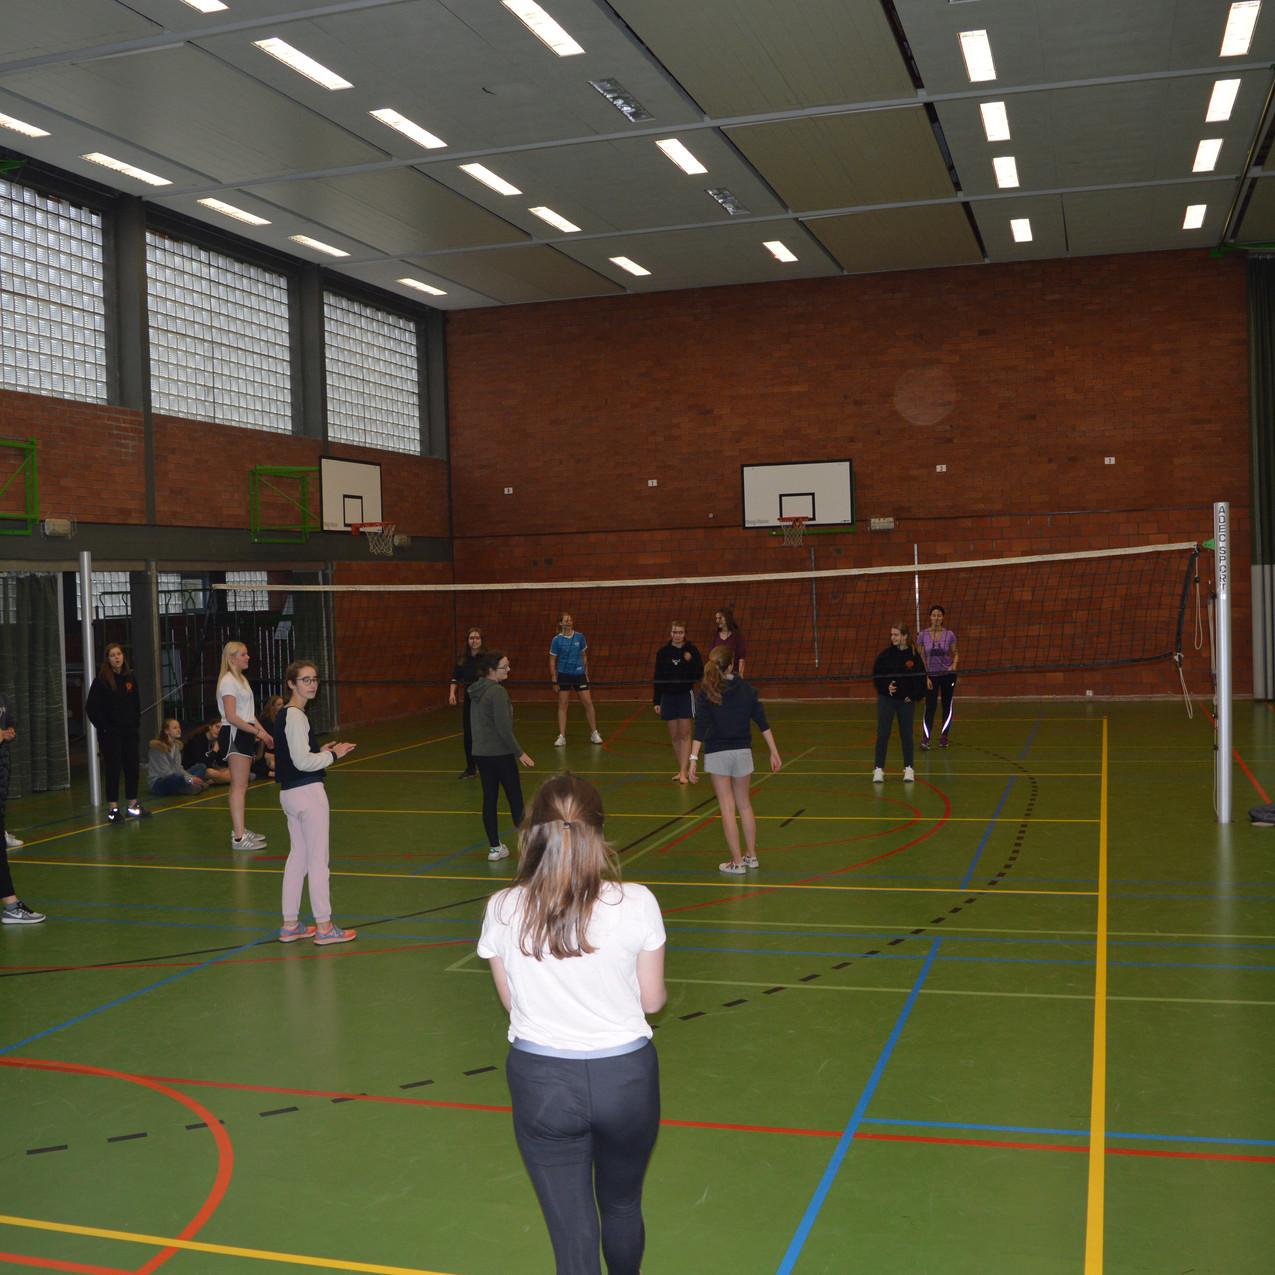 20171207 examensport (4)